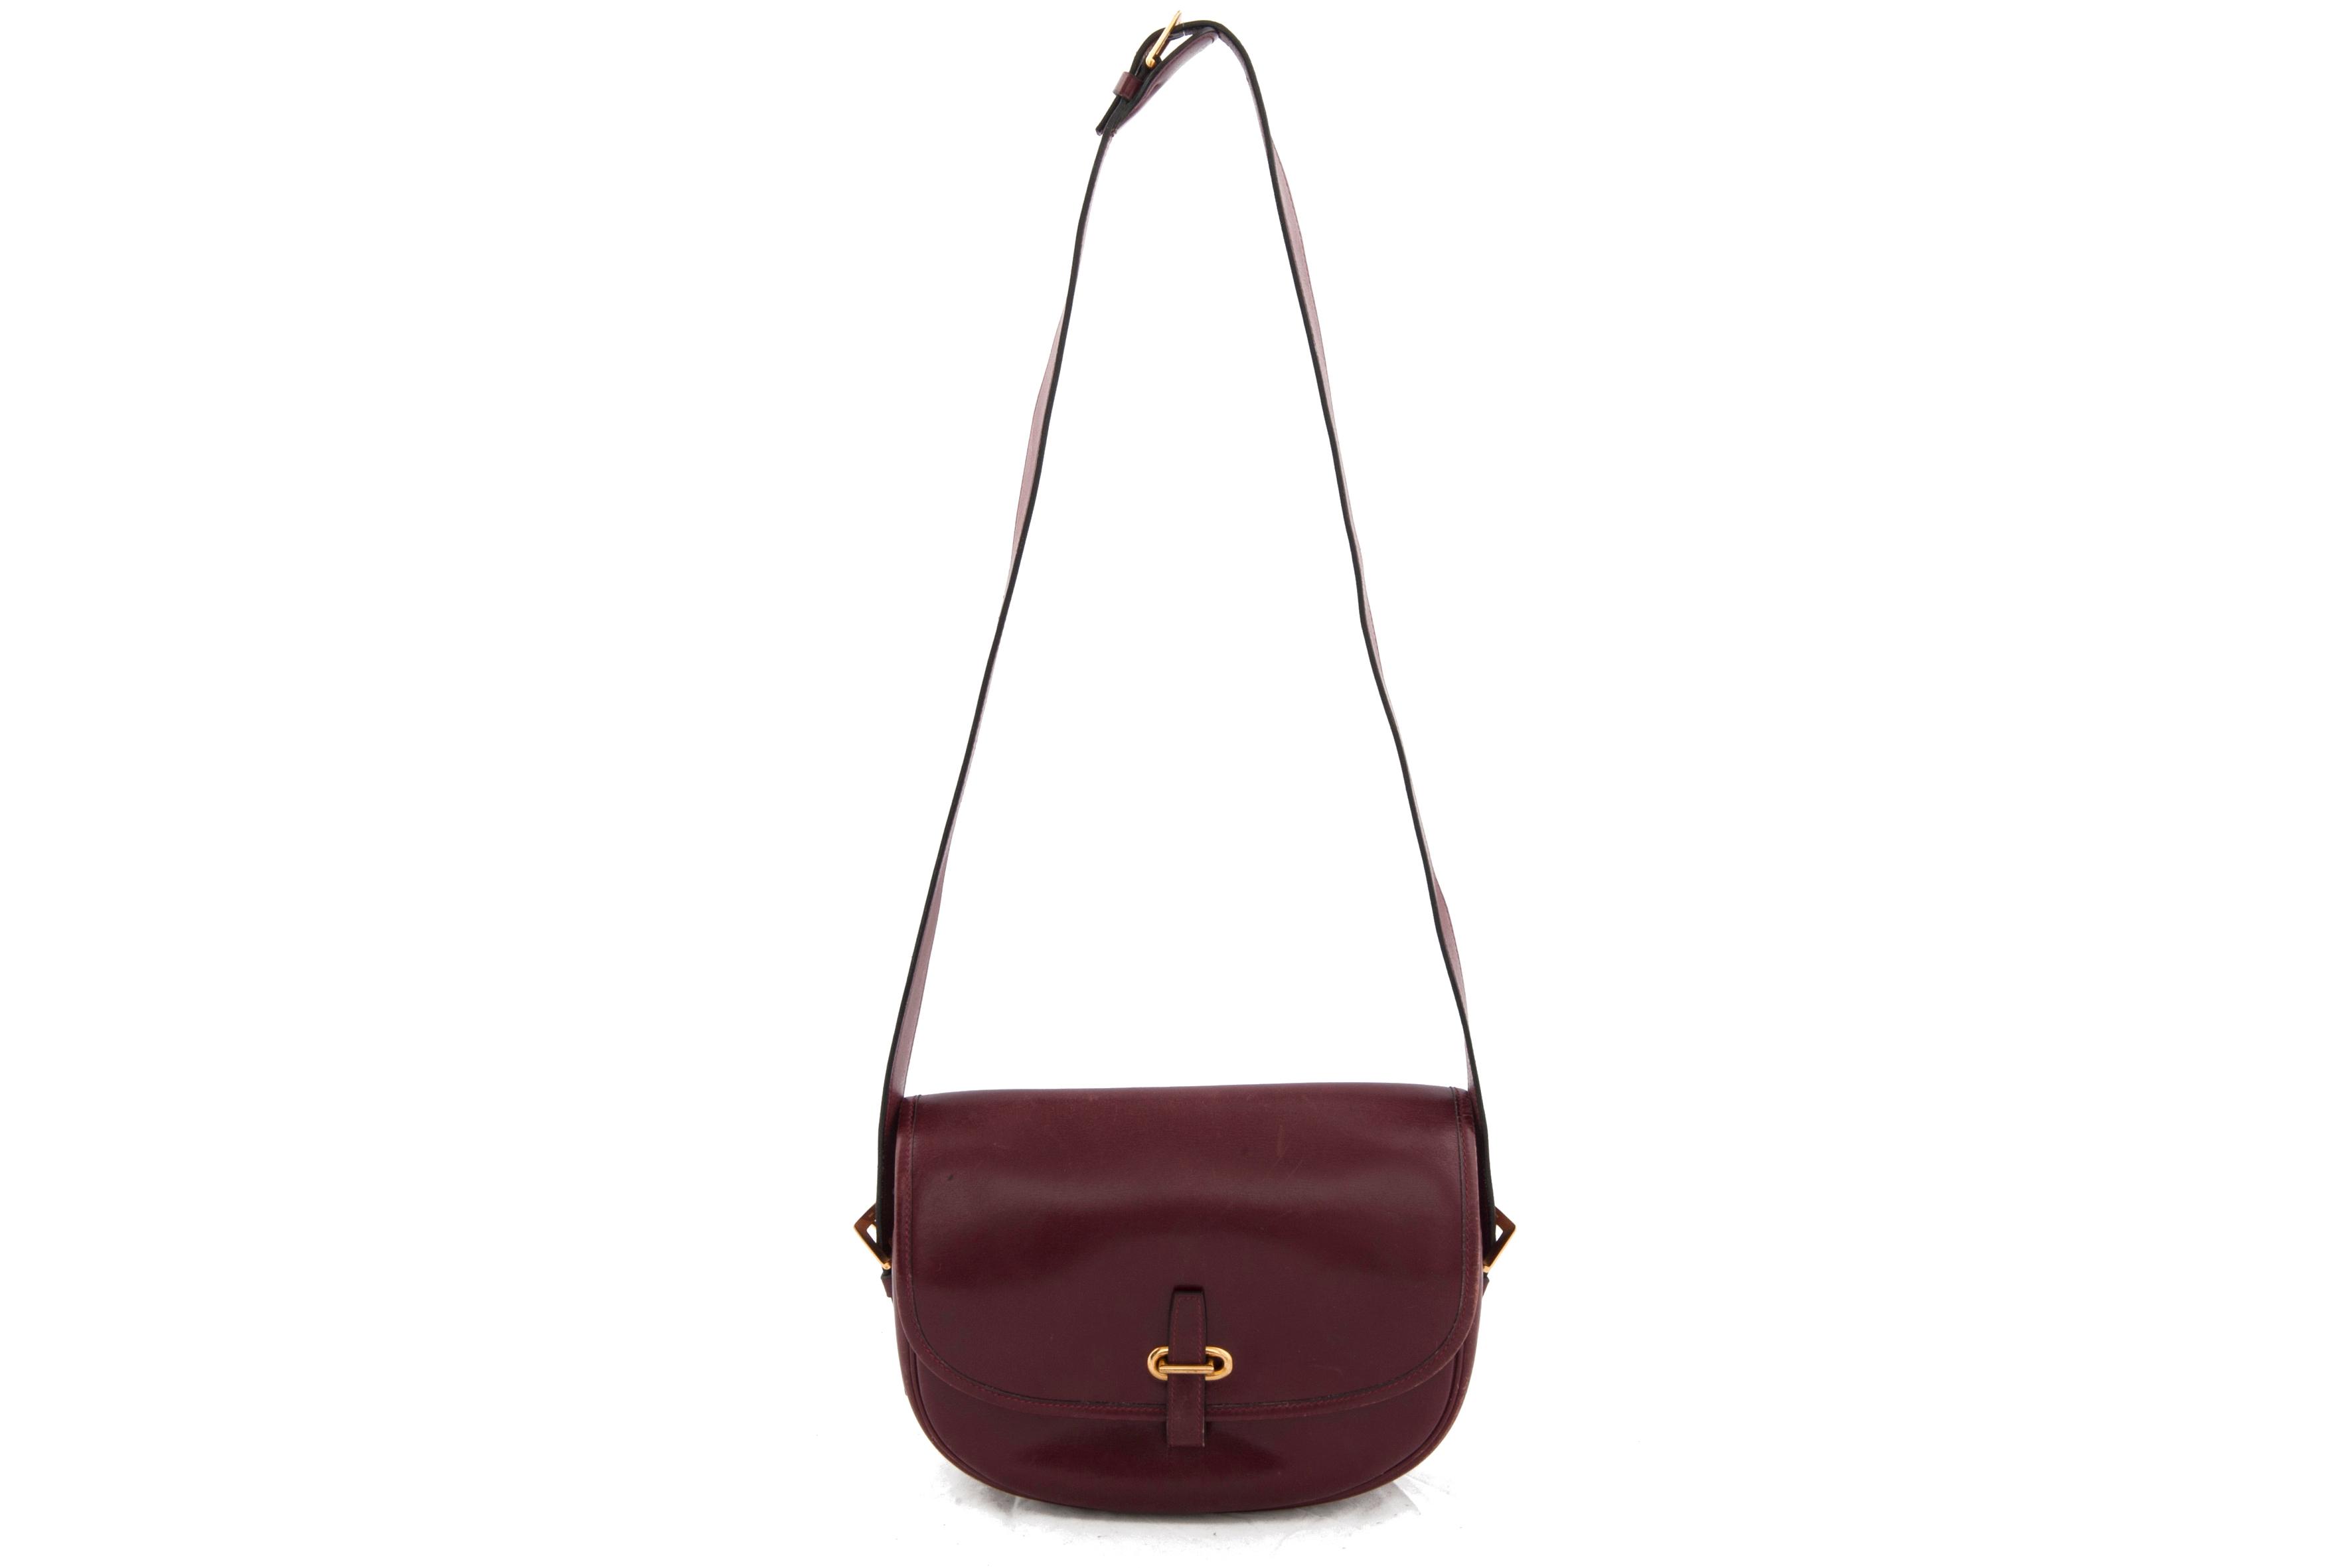 Hermes \u0026#39;\u0026#39;balle de golf\u0026#39;\u0026#39; red box leather - Vintage Shop in Mykonos